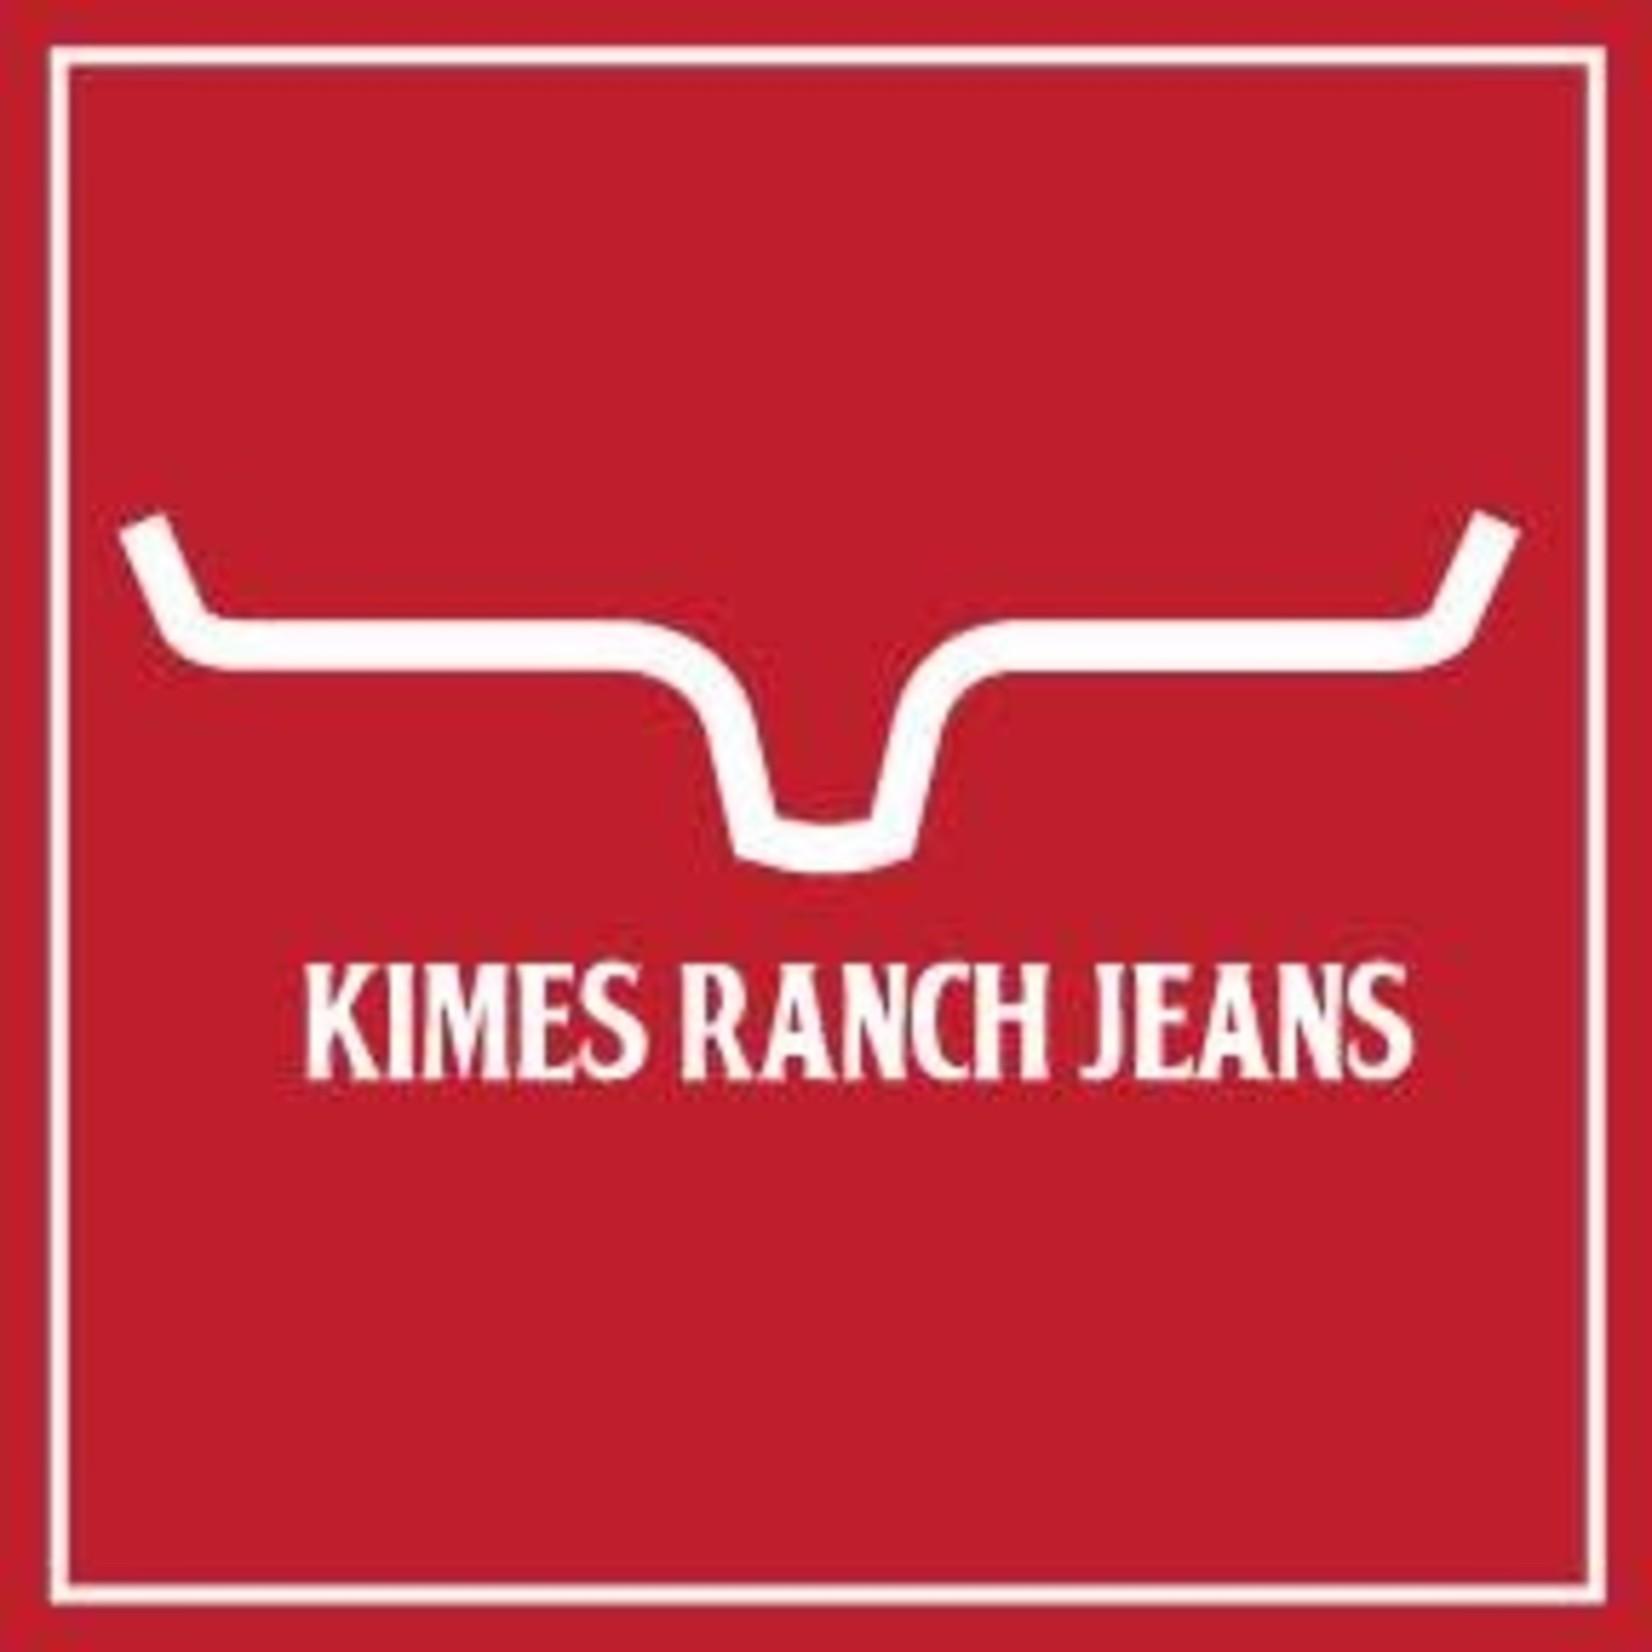 Kimes Lola Jeans